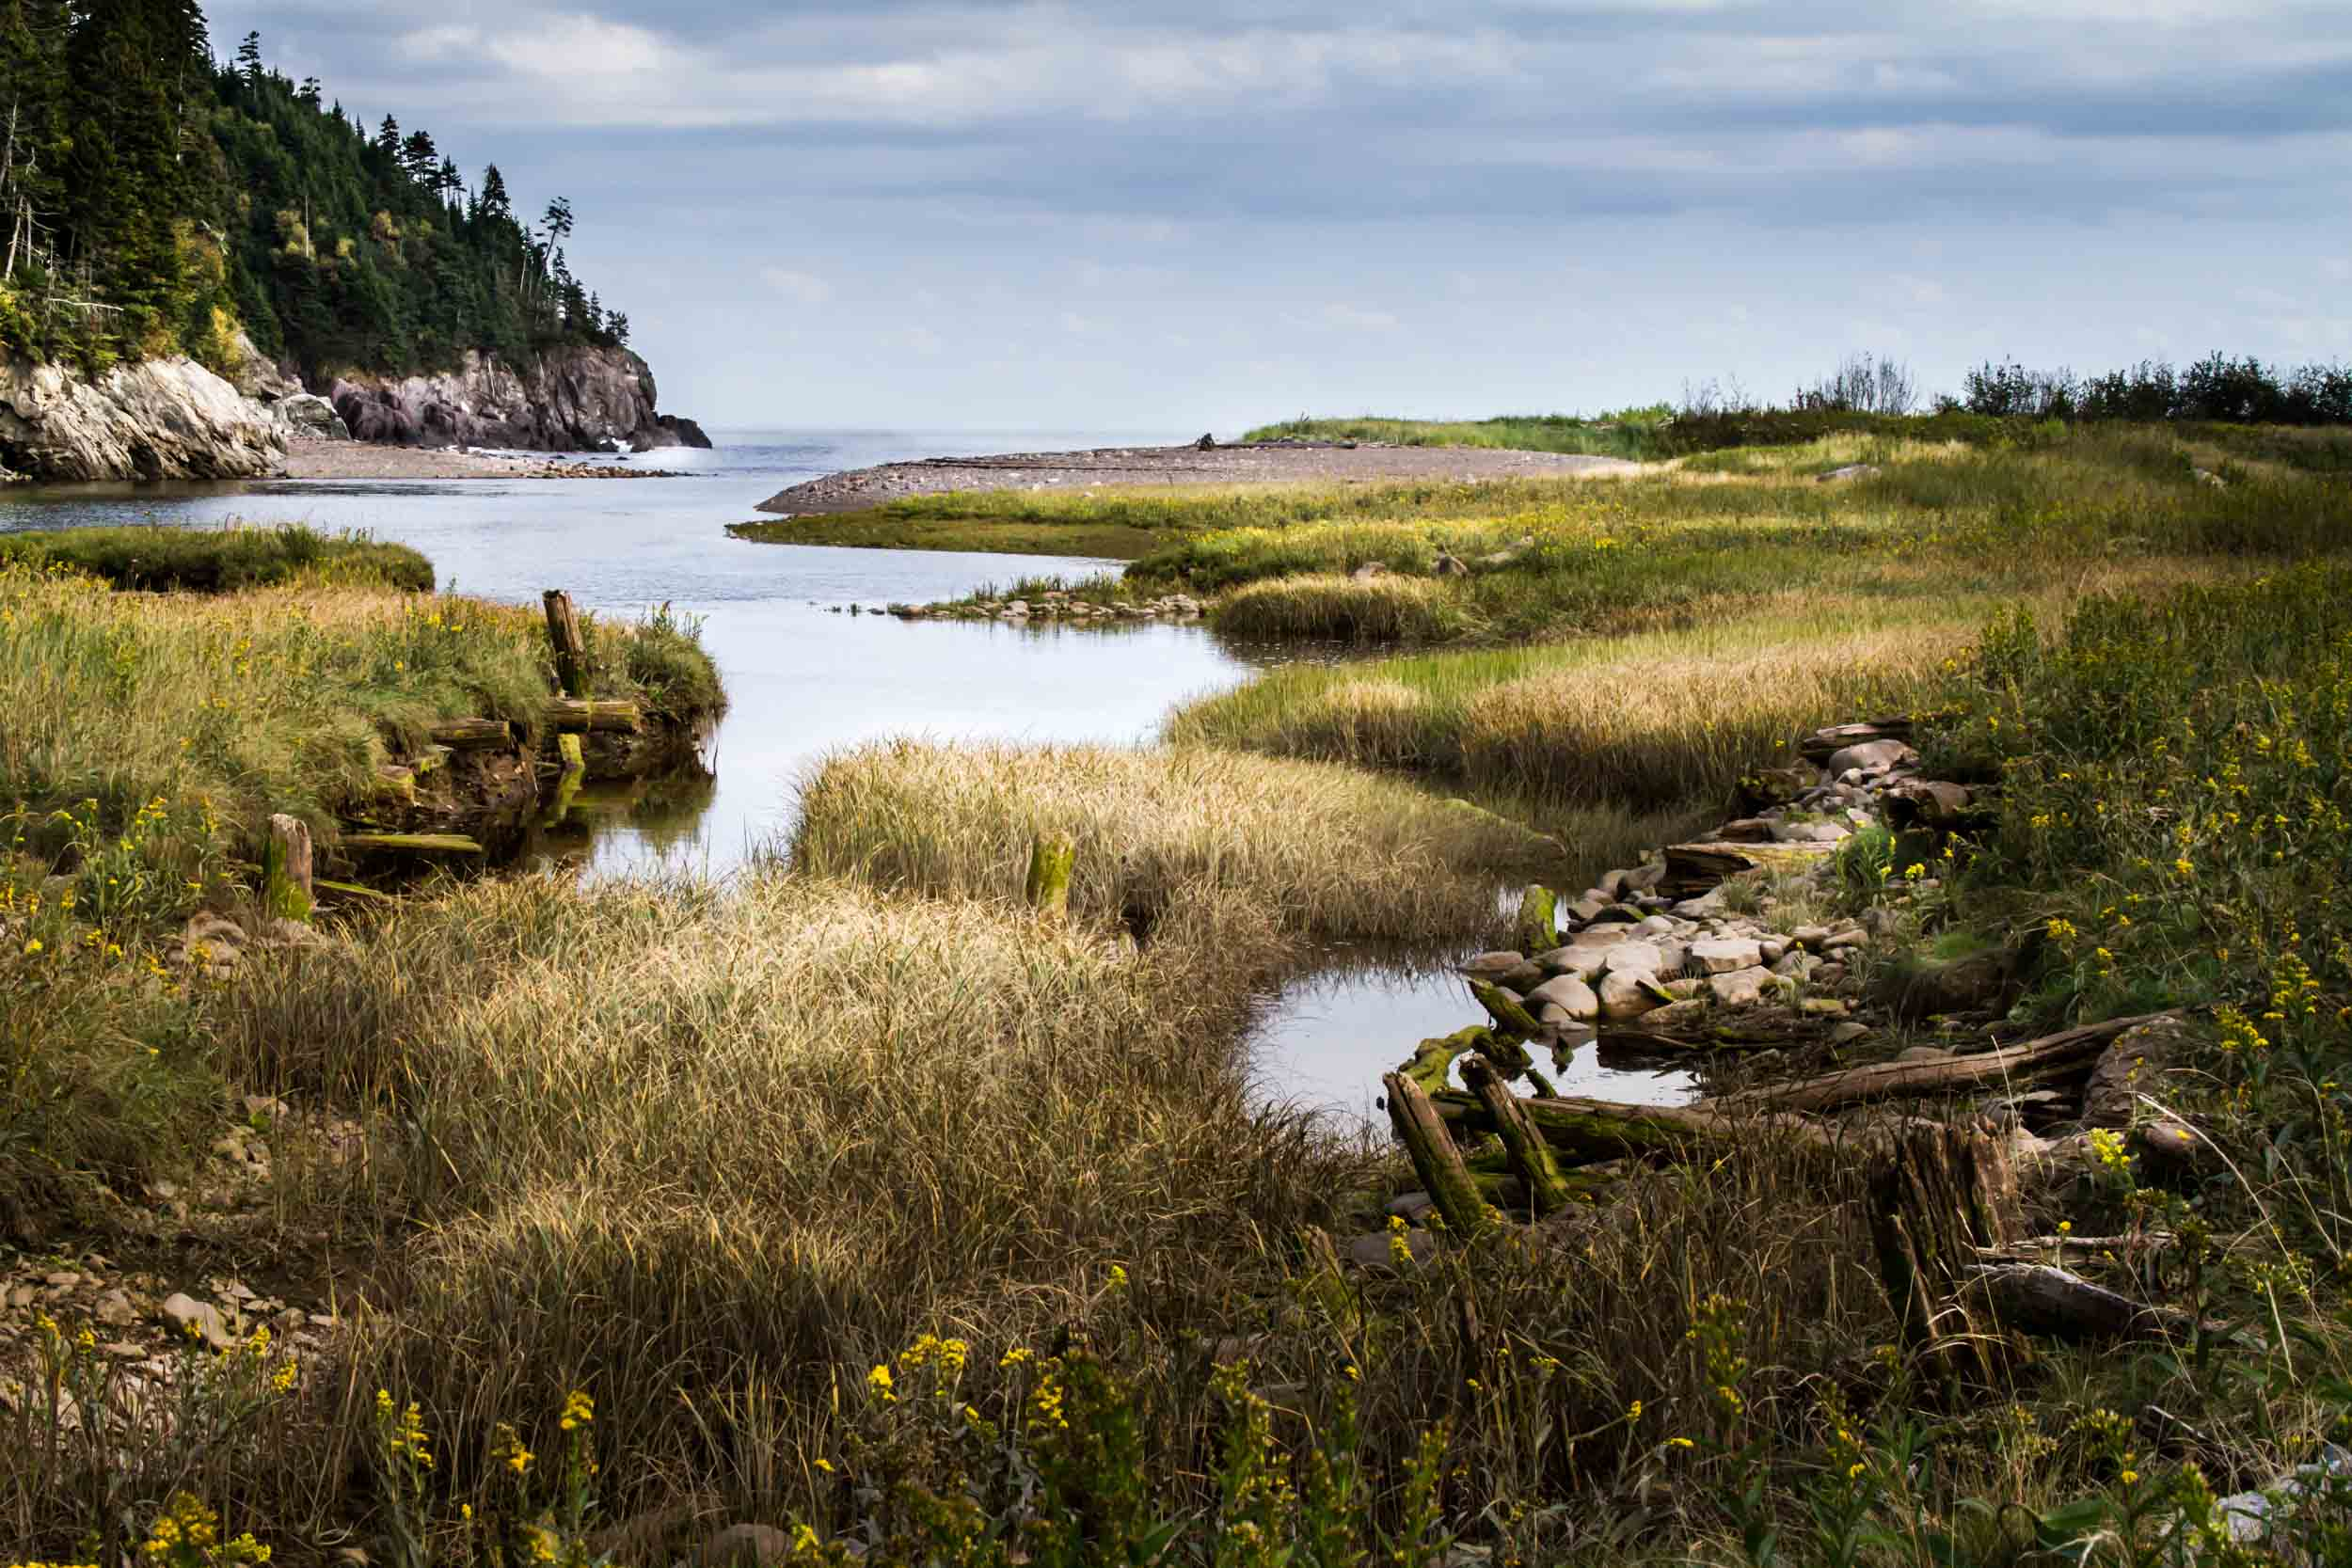 Salmon River, Bay of Fundy, New Brunswick  6818